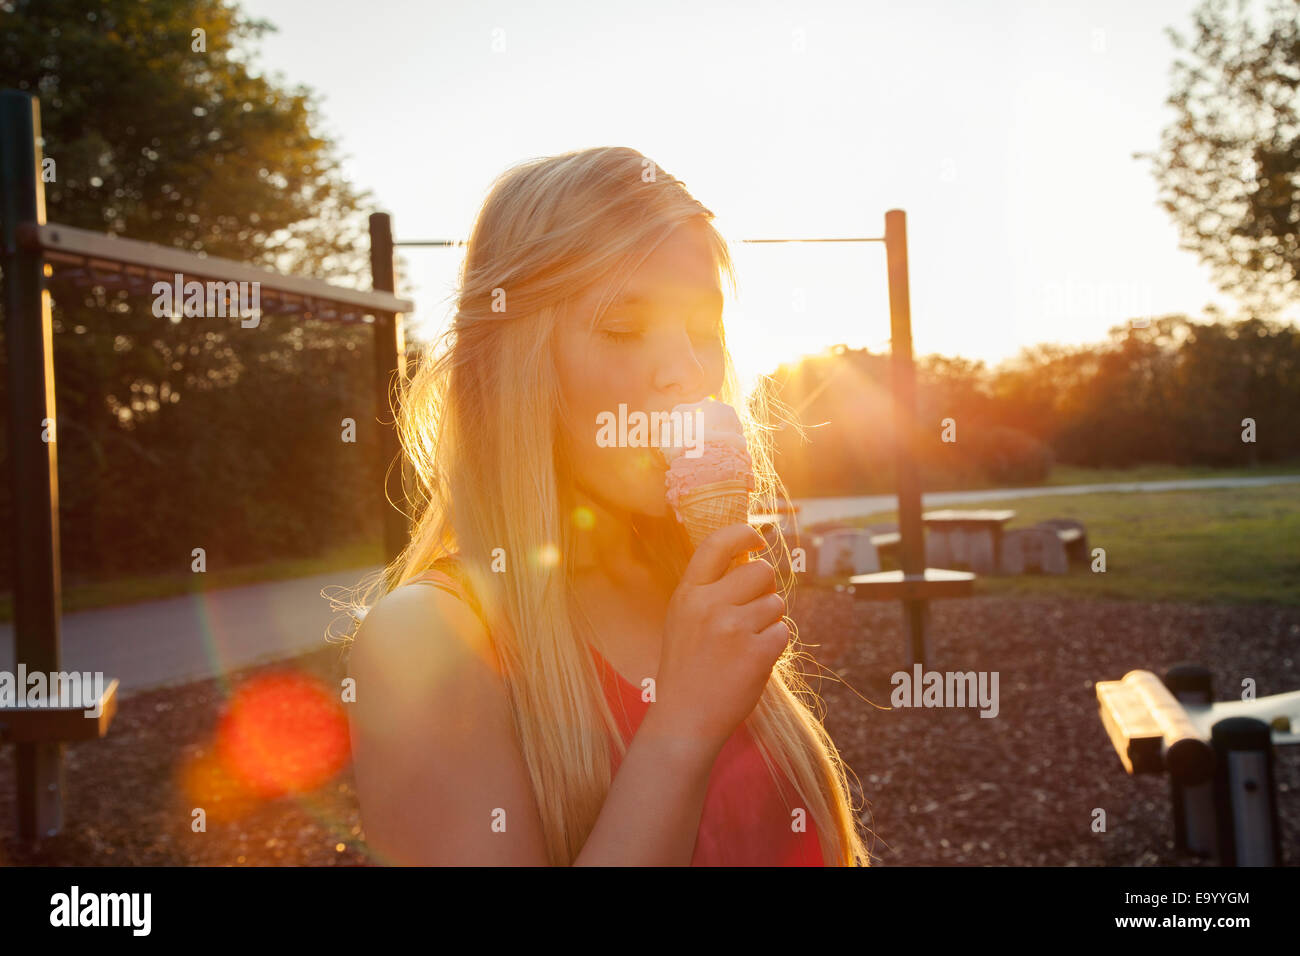 Young woman eating ice cream cone dans Park au coucher du soleil Photo Stock